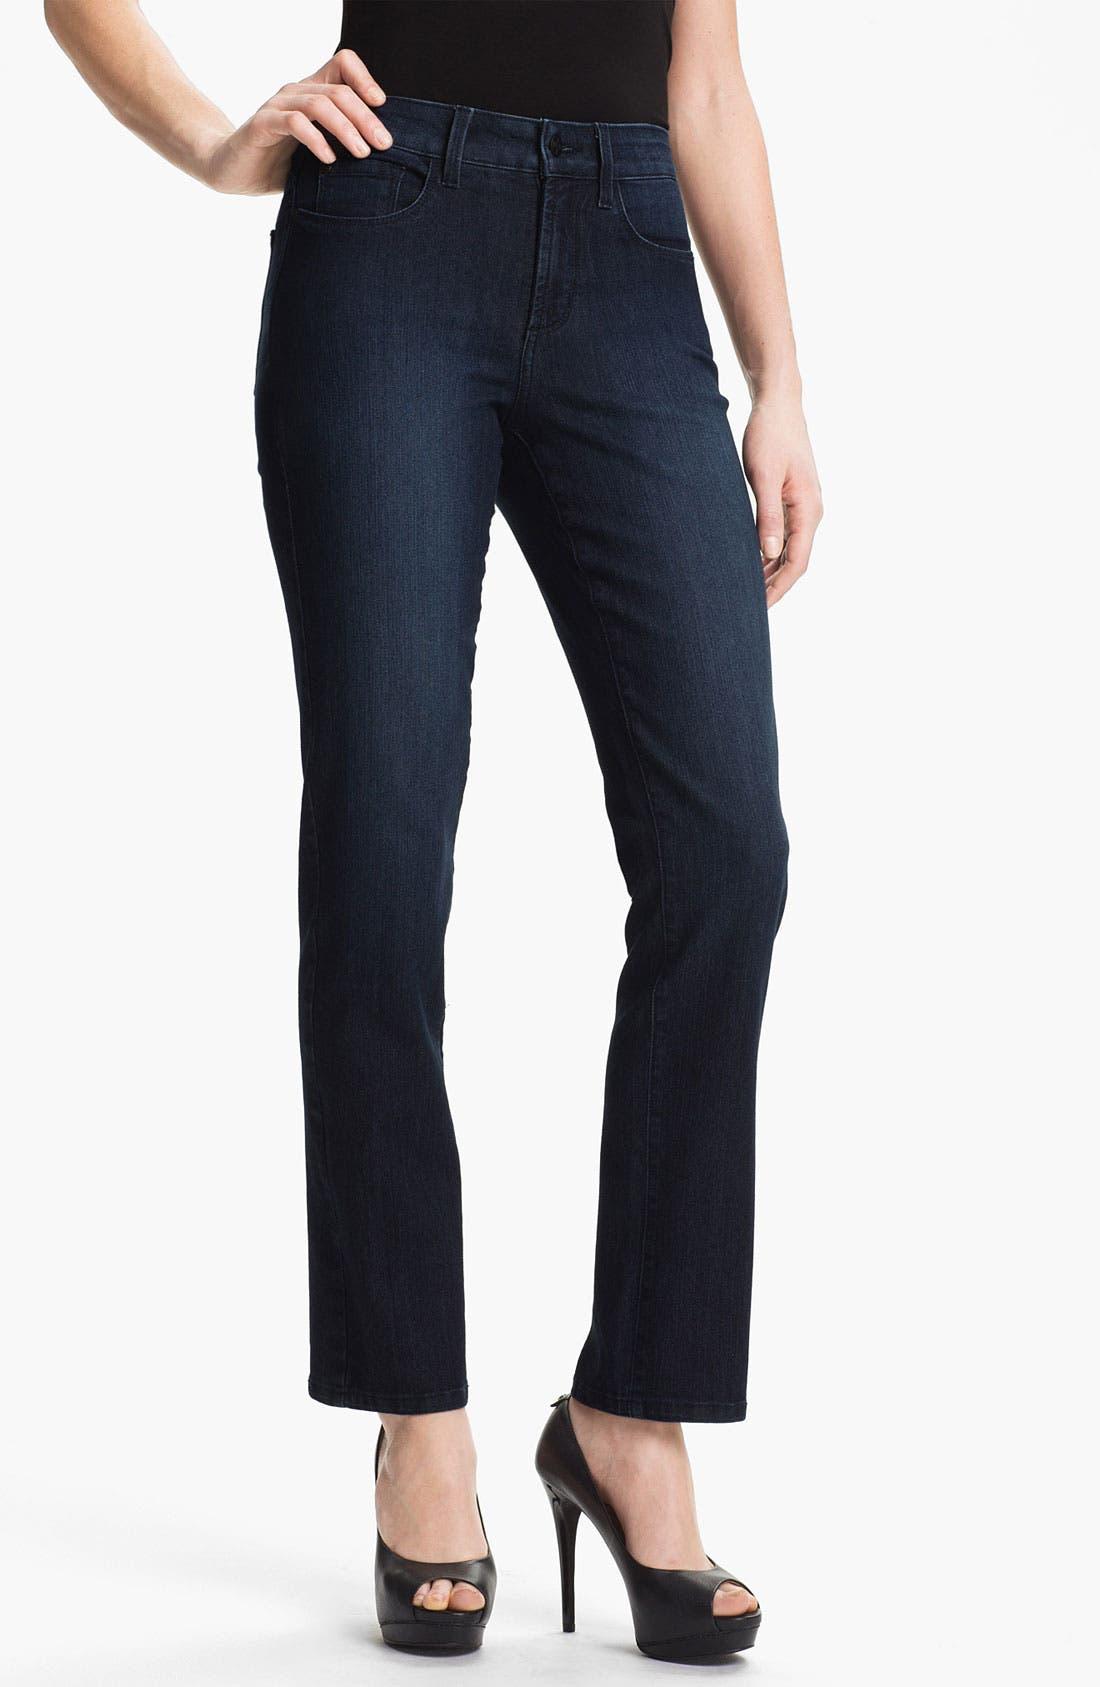 Alternate Image 1 Selected - NYDJ Studded 'Sheri' Skinny Jeans (Petite)